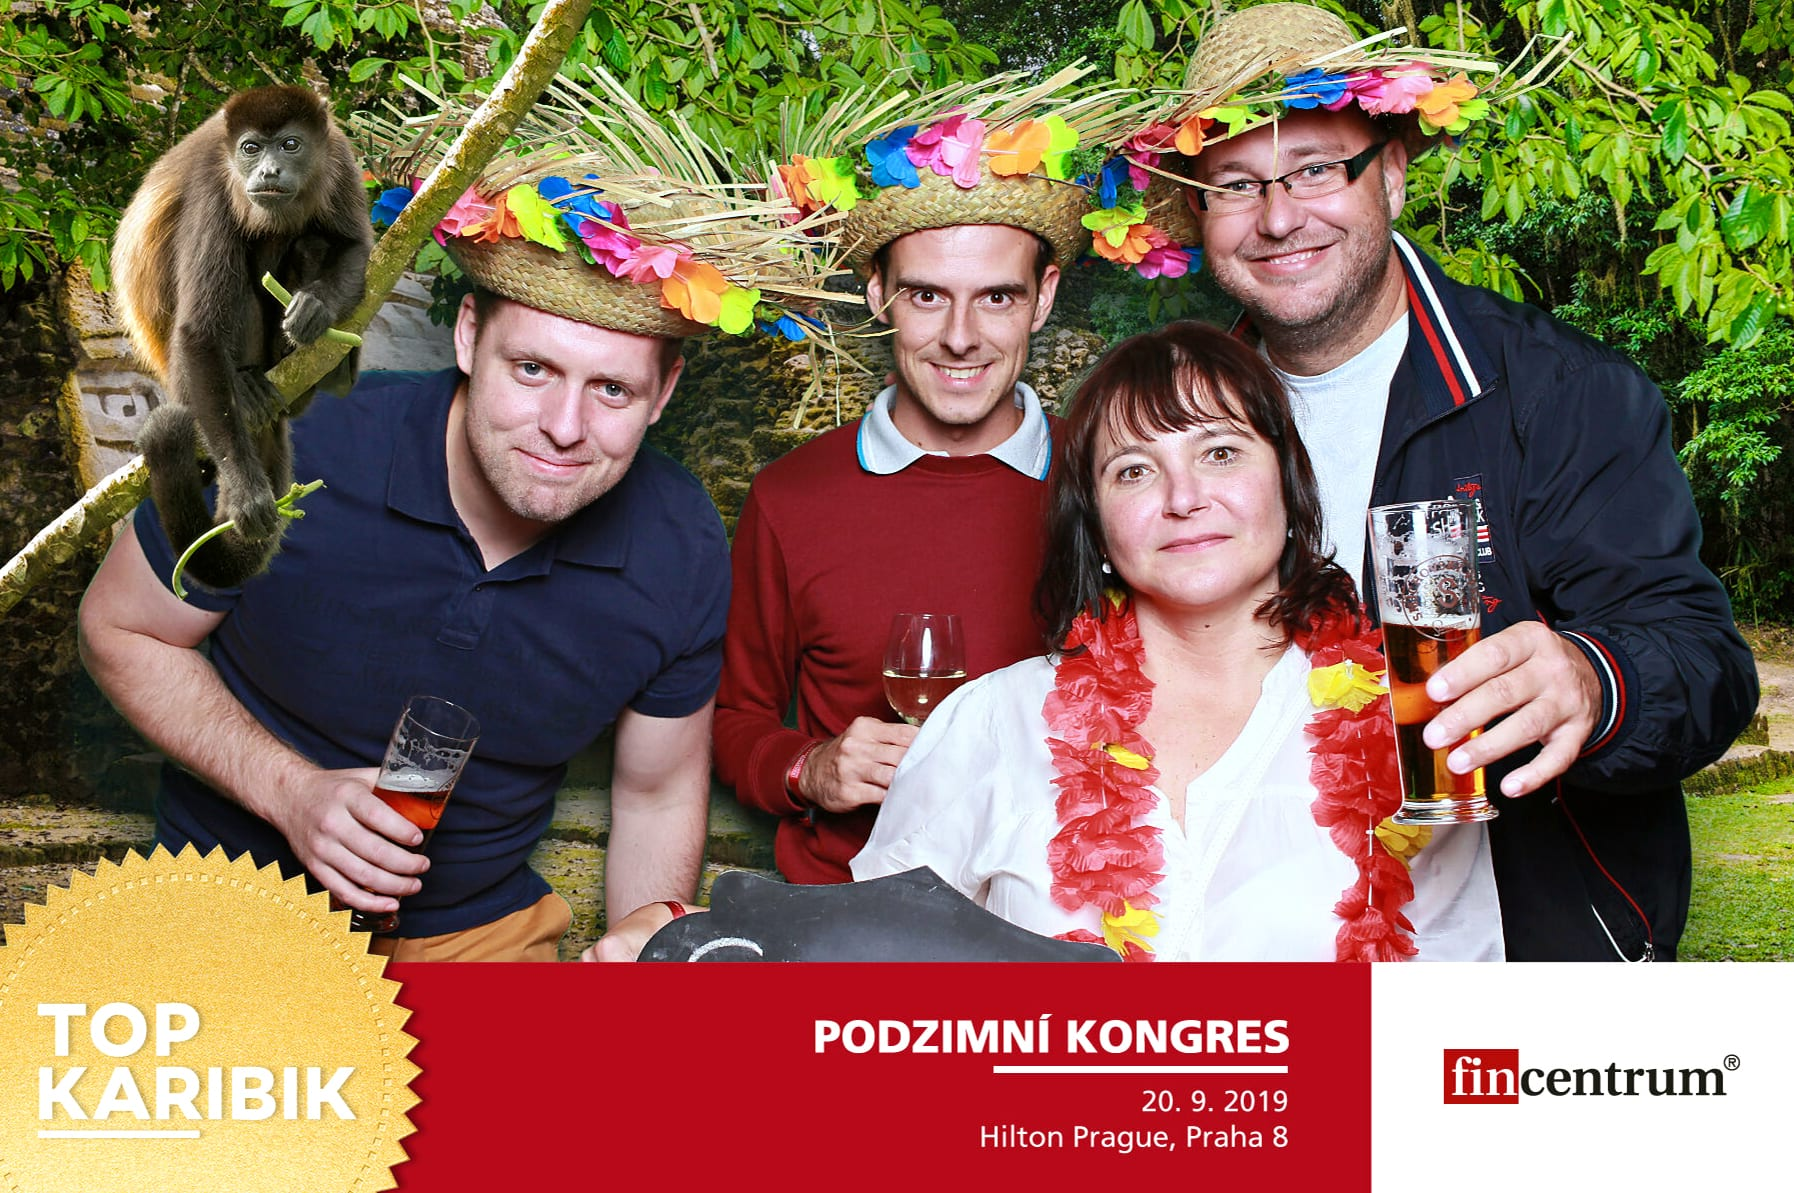 fotokoutek-konference-praha-fincentrum-podzimni-kongres-20-9-2019-655329